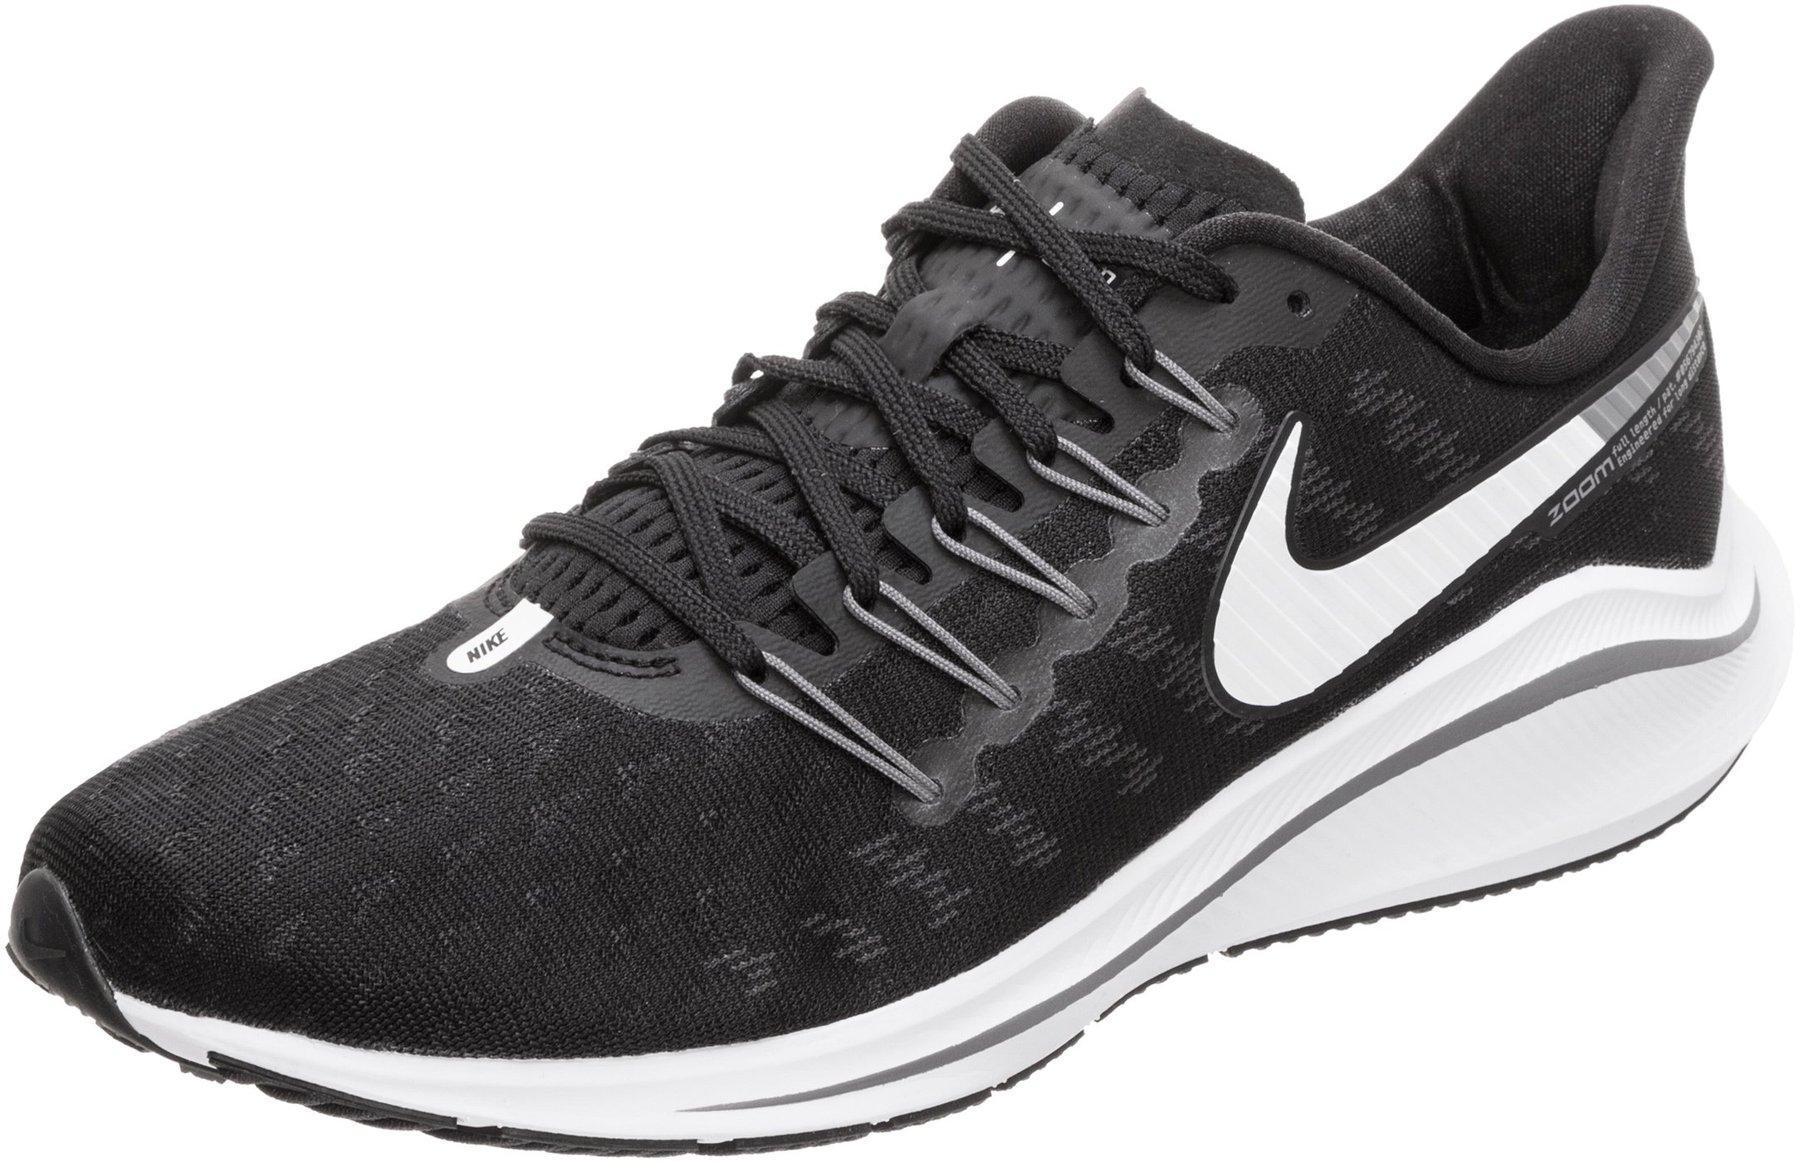 Nike Air Zoom Vomero 14 Men (AH7857) BlackThunder Grey White